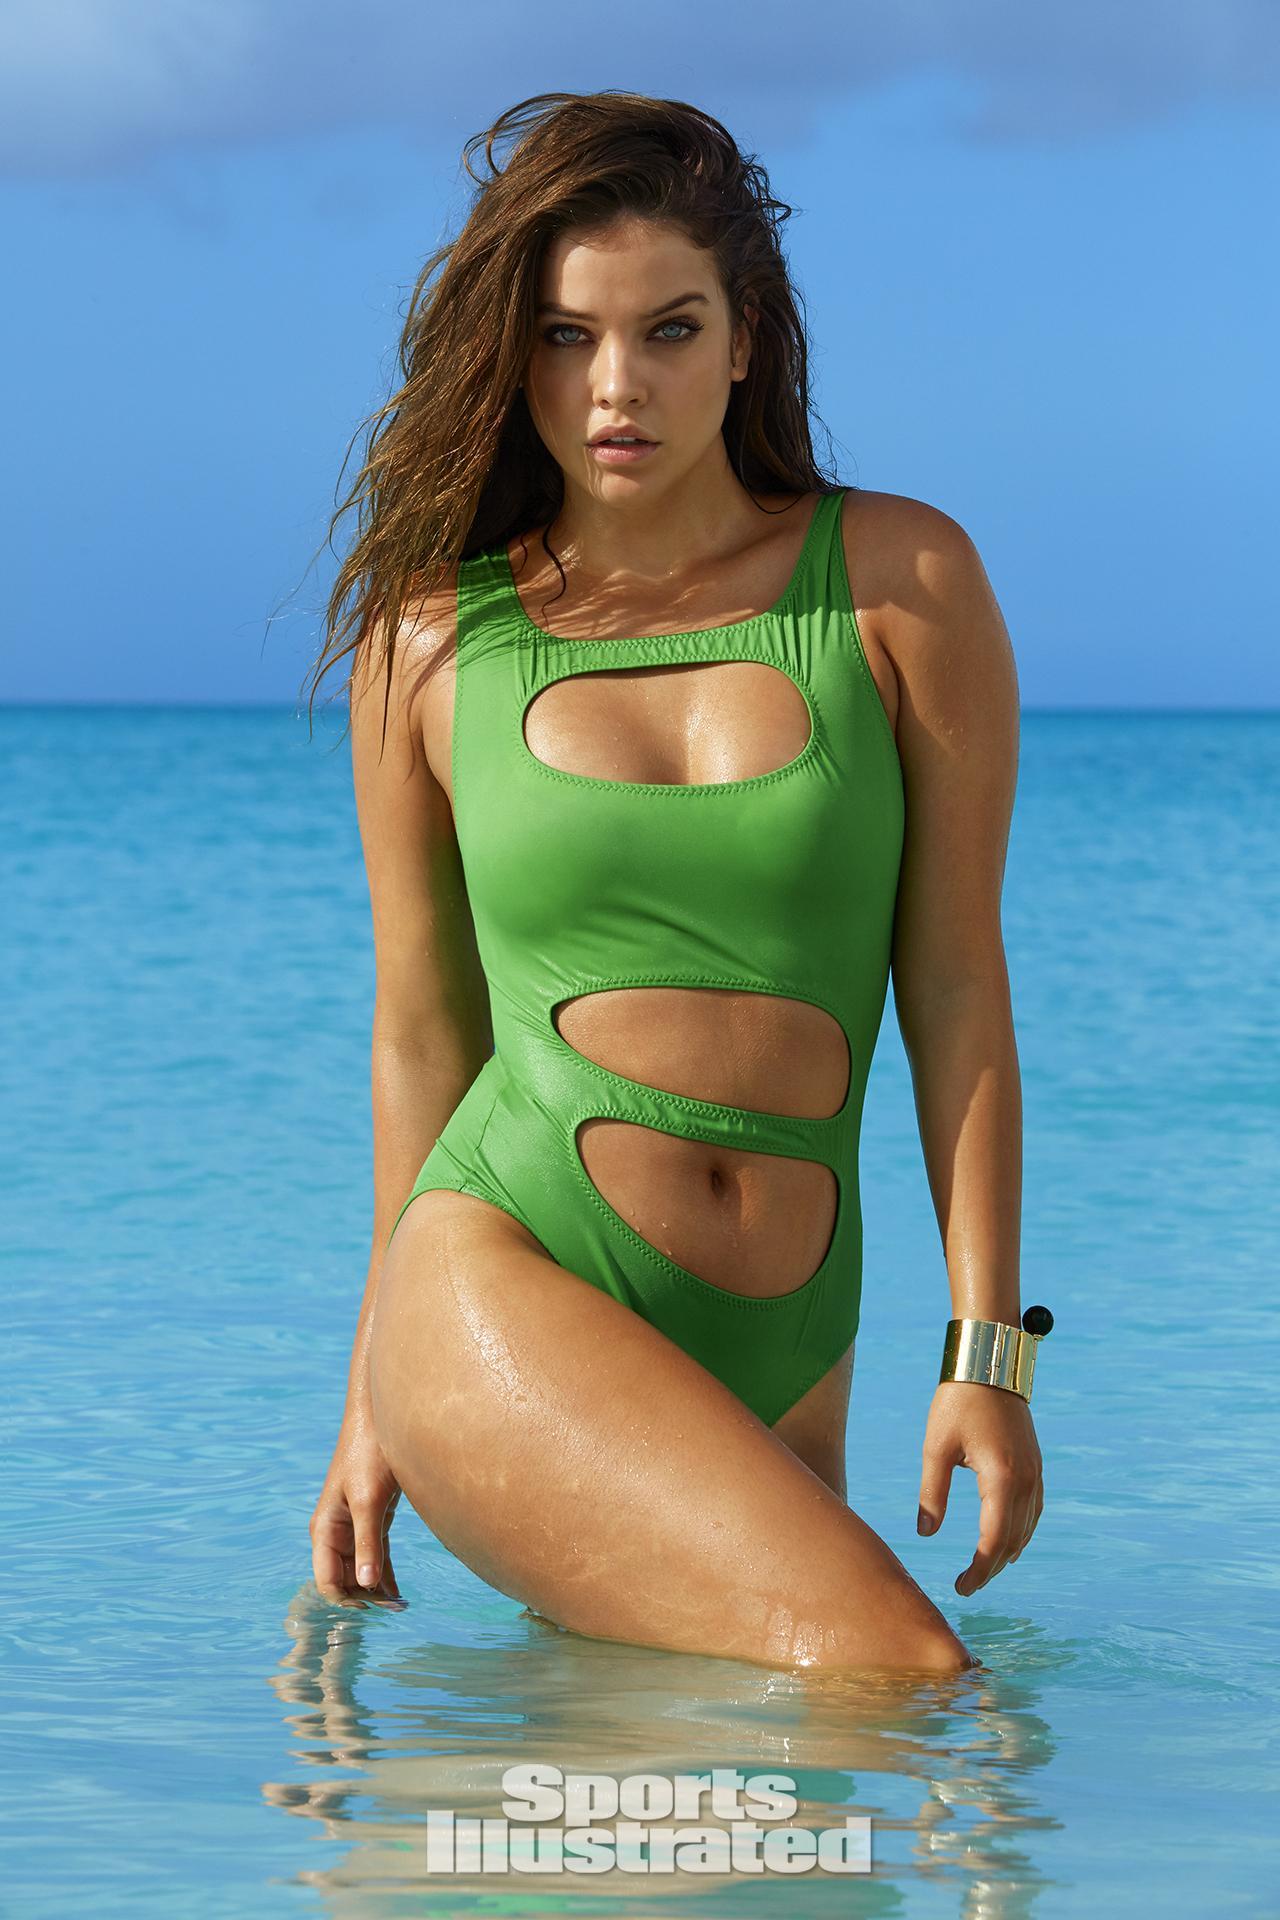 Barbara Palvin Swimsuit Photos, Sports Illustrated ...